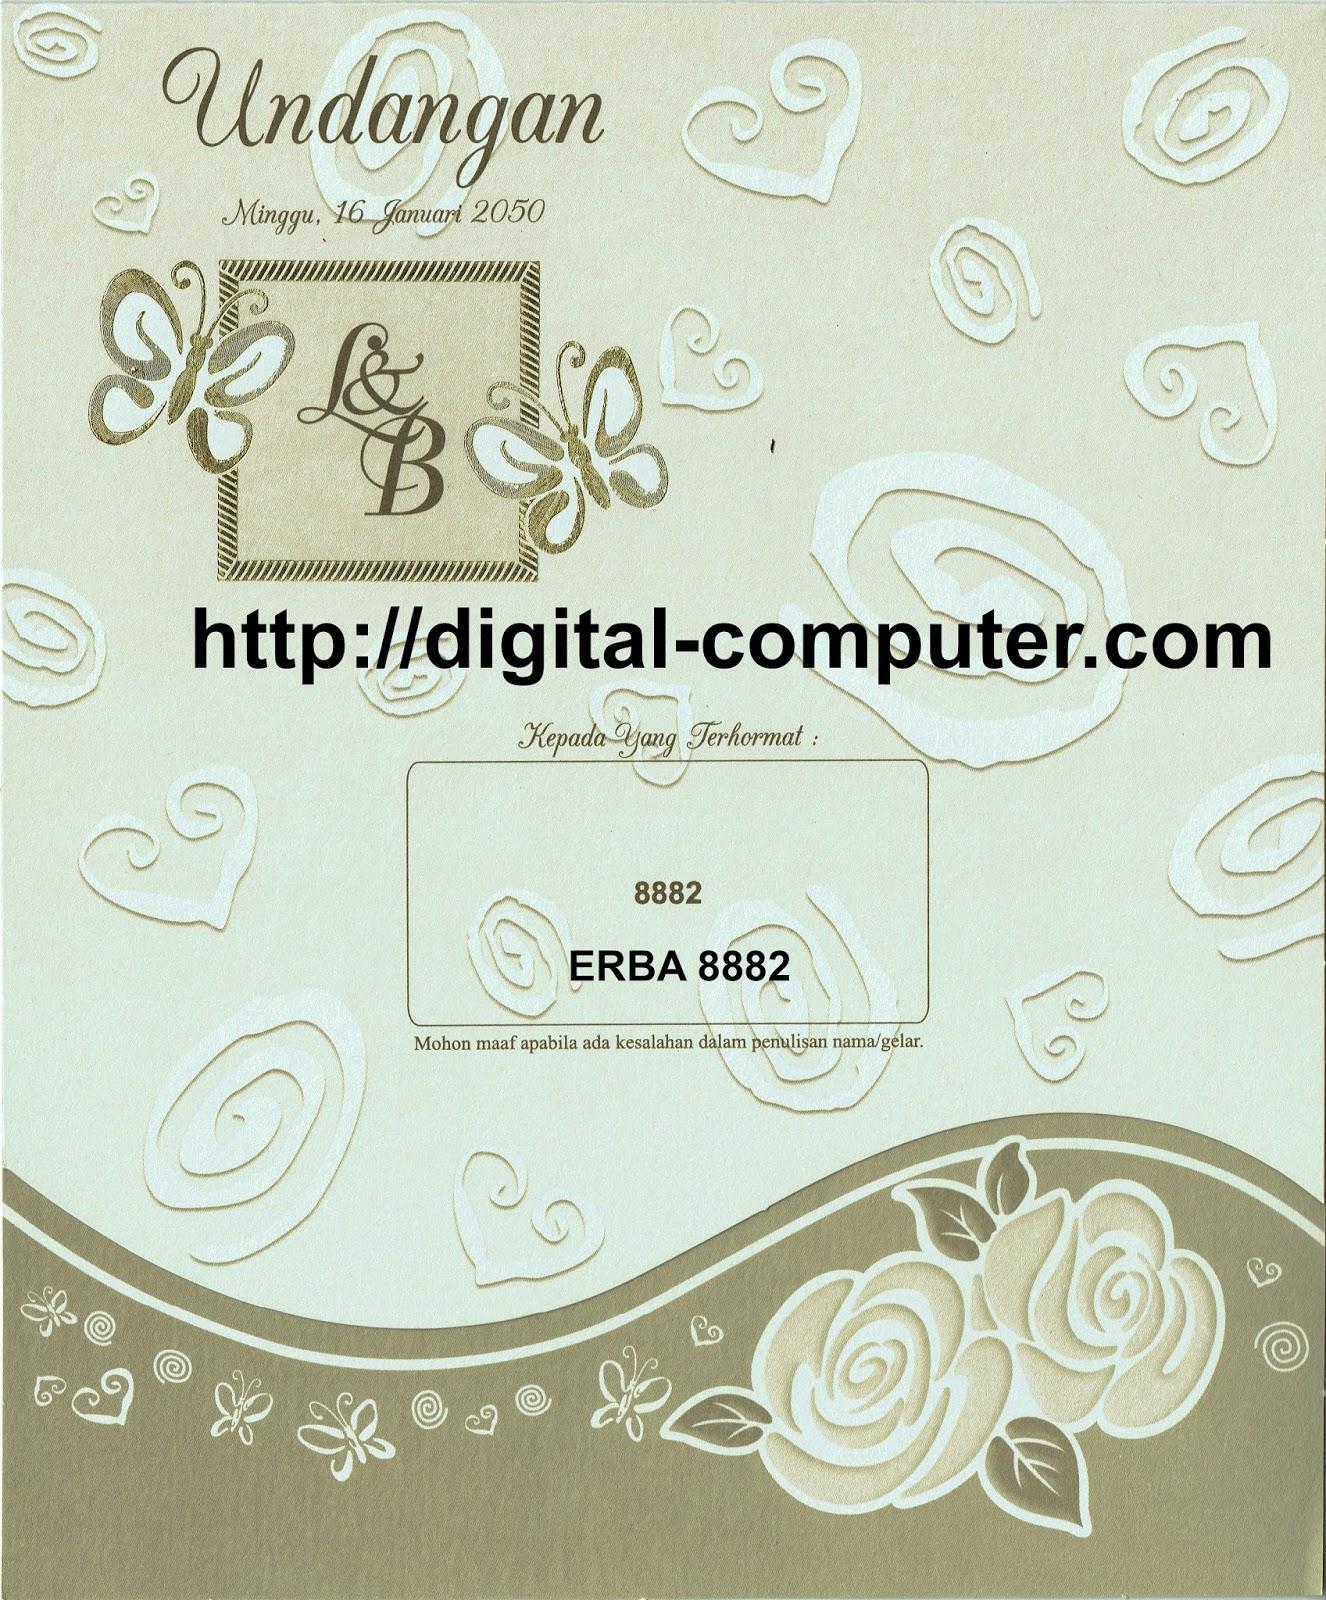 Undangan Softcover ERBA 8882